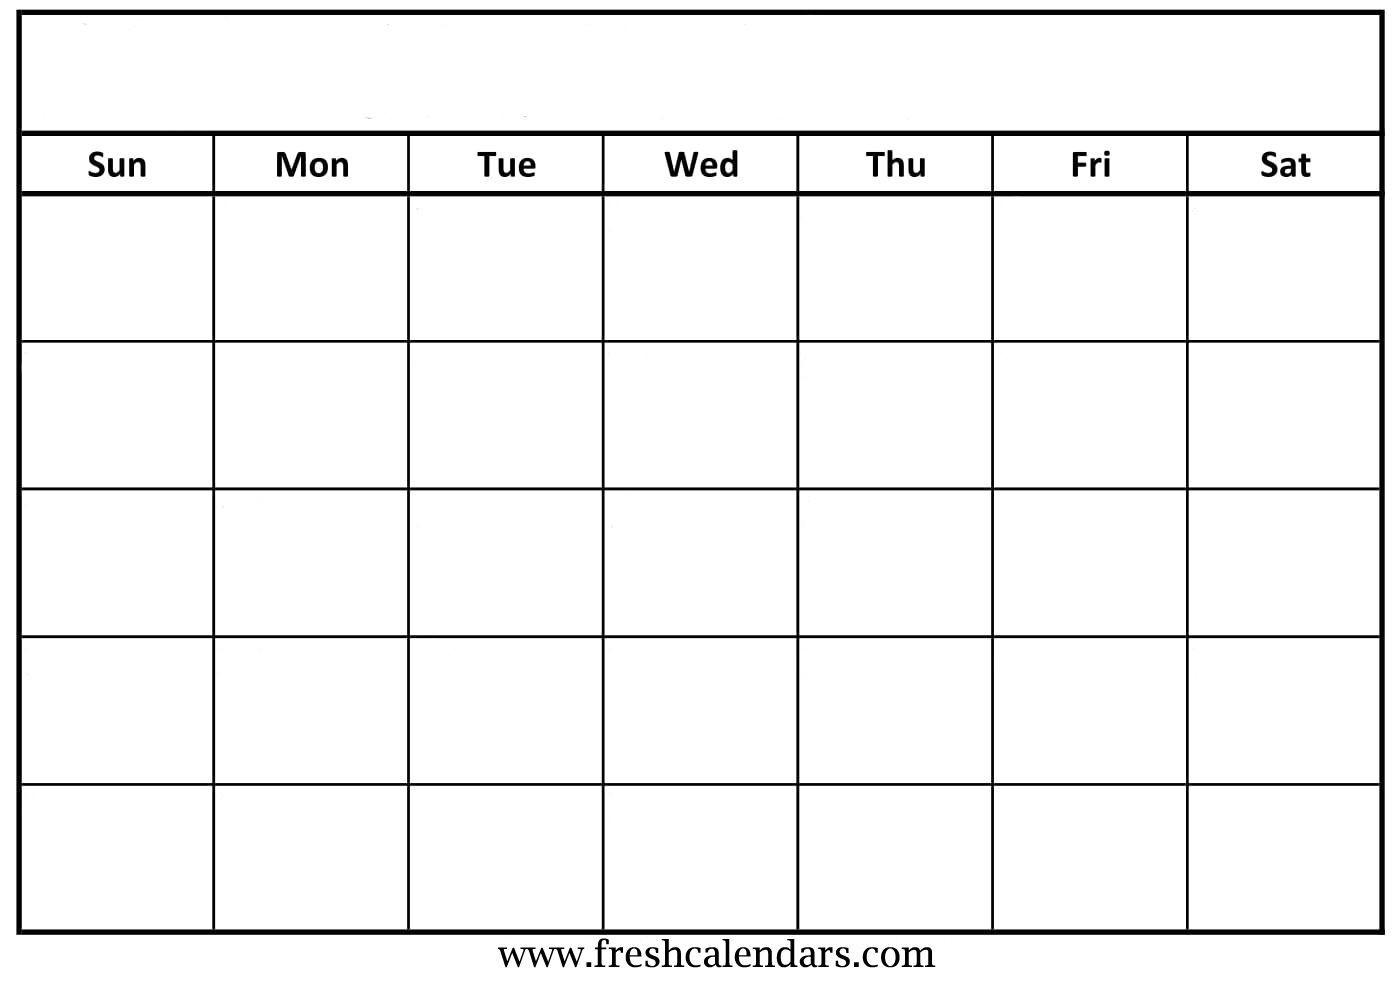 30 Blank Calendar Template 2019 | Andaluzseattle Template-Blank Calendar Page Printable